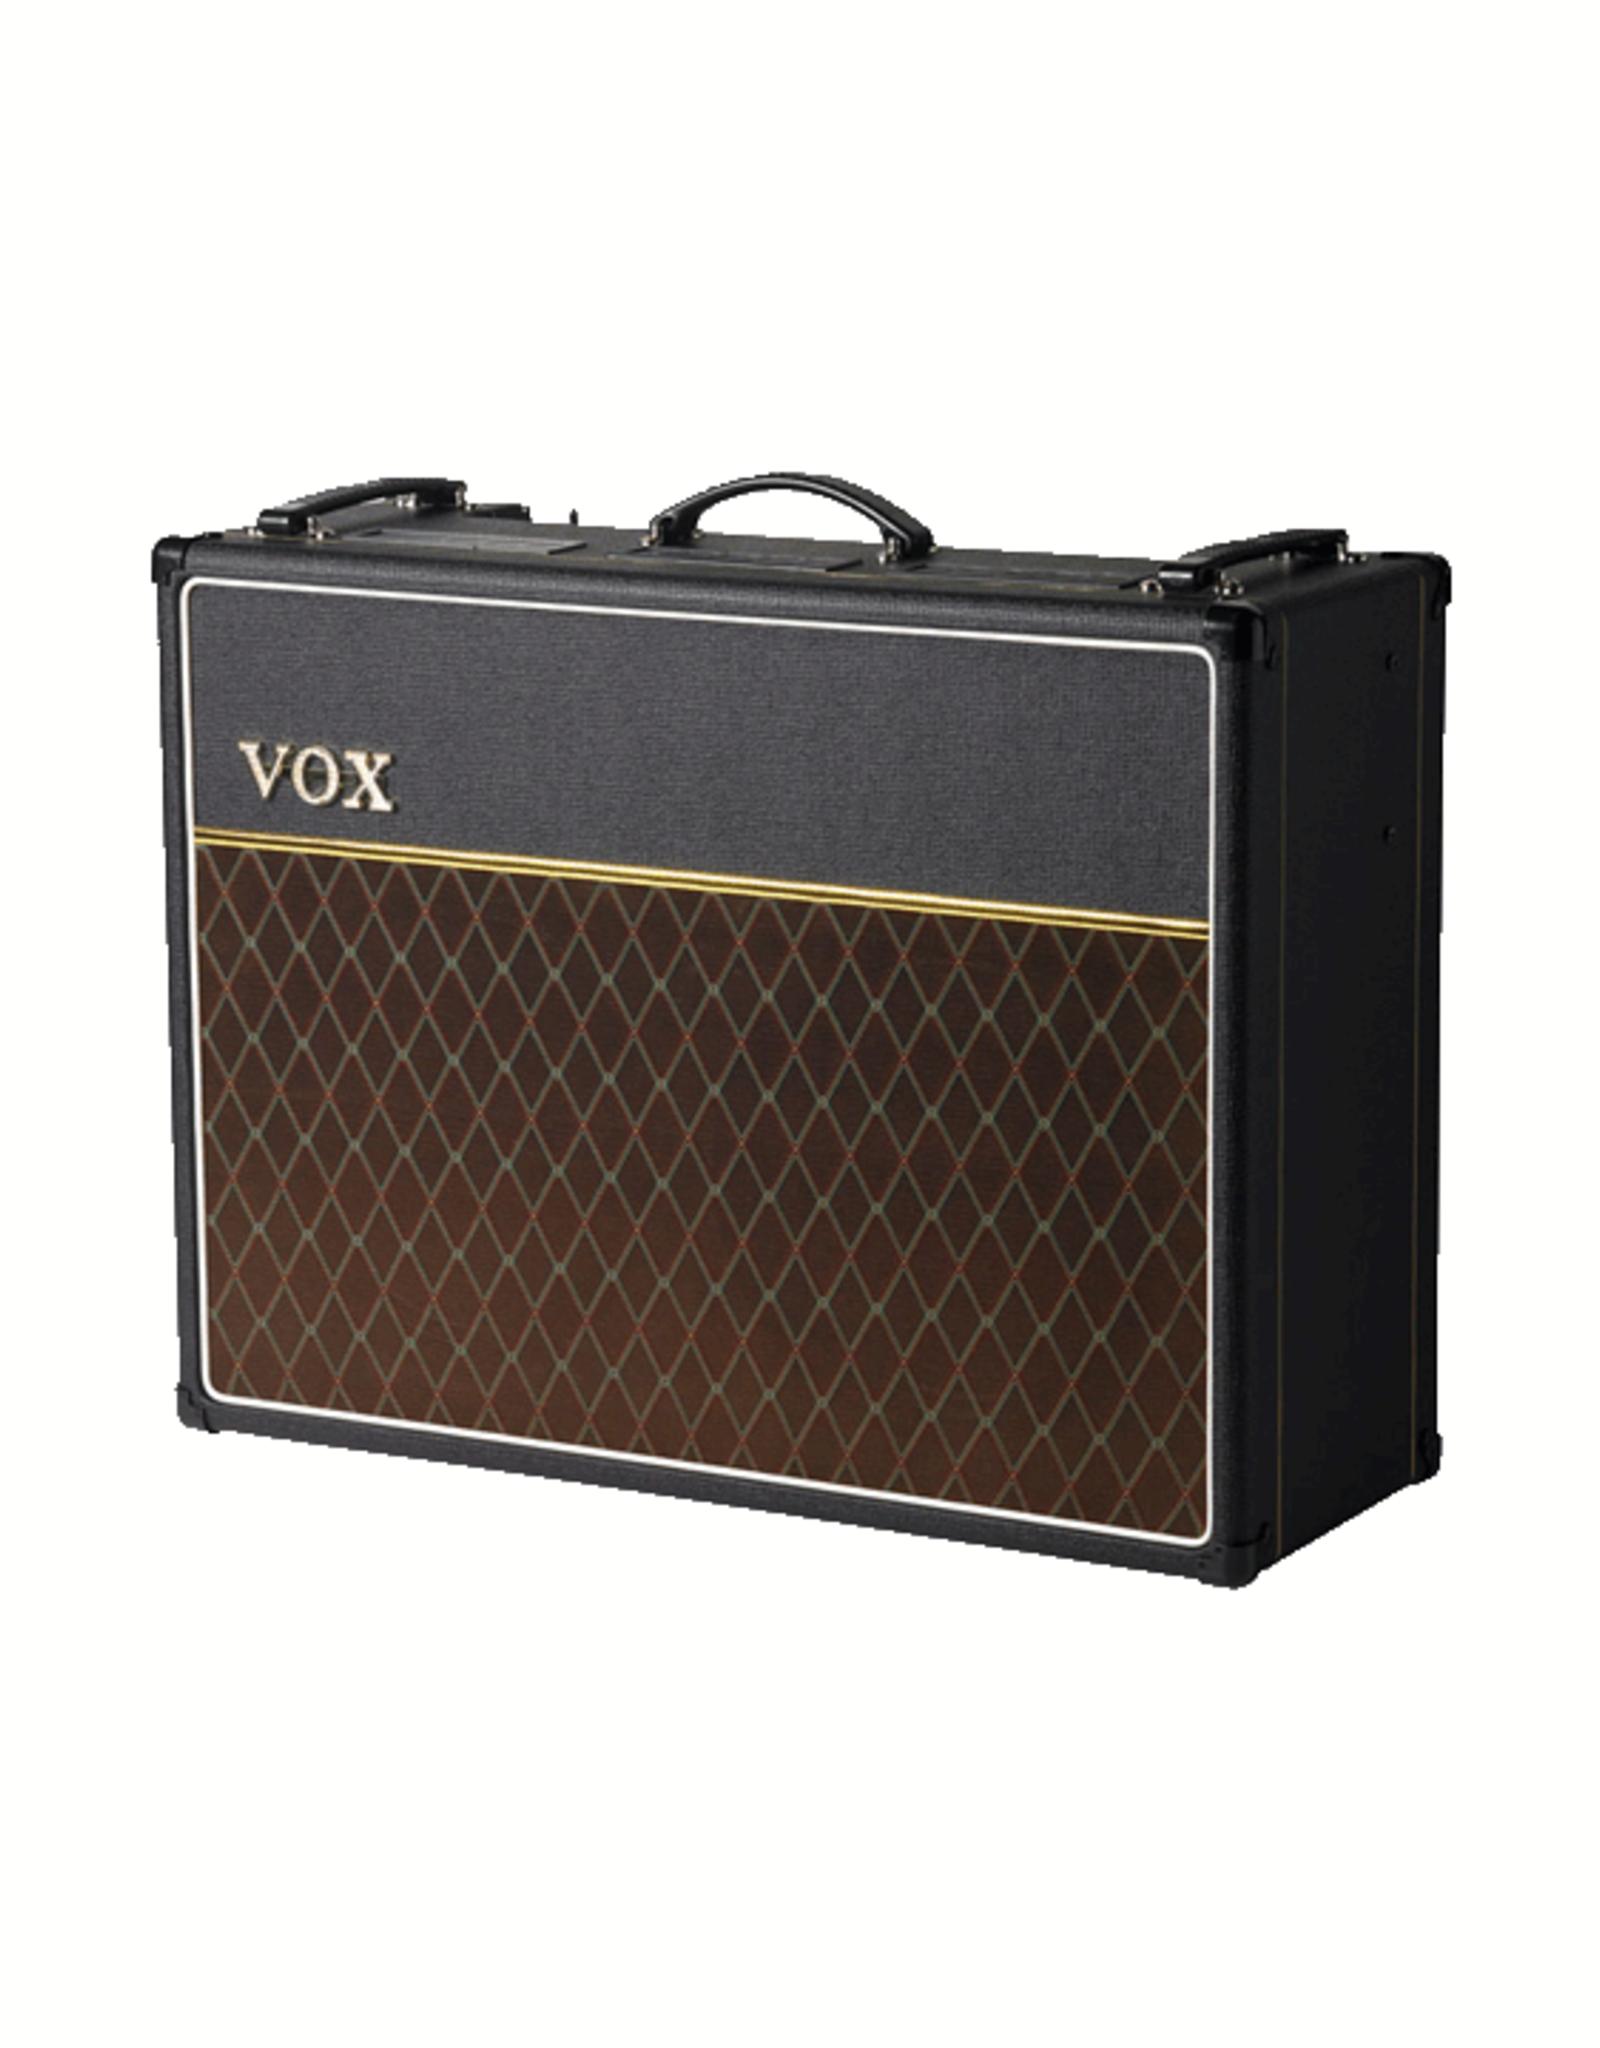 "Vox Vox AC30C2 30 watt 2x12"" combo with Celestion Greenback speakers"